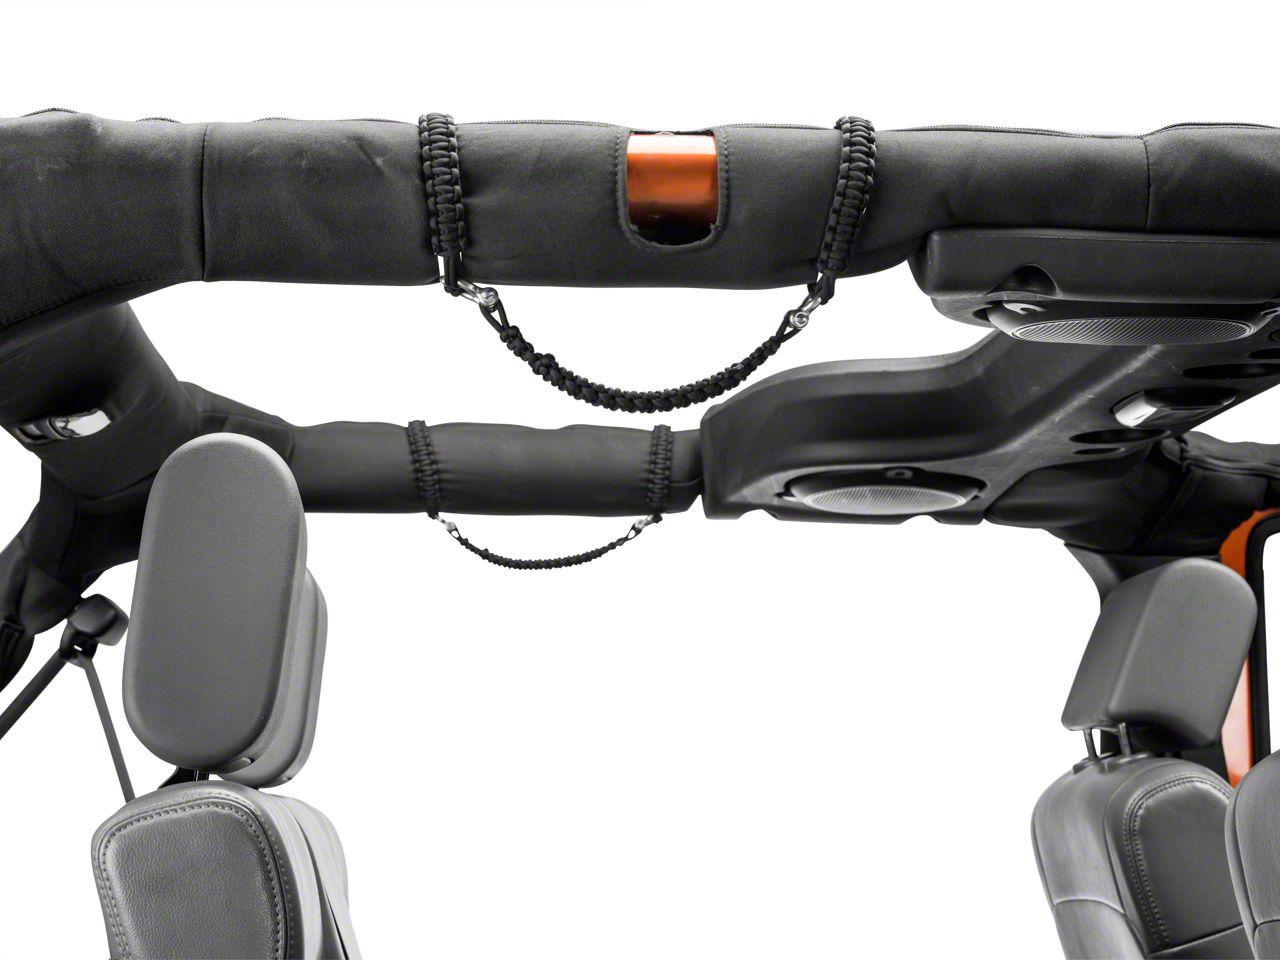 RedRock 4x4 Rear Rollbar Paracord Grab Handles with D-rings - Black (07-18 Jeep Wrangler JK 4 Door)